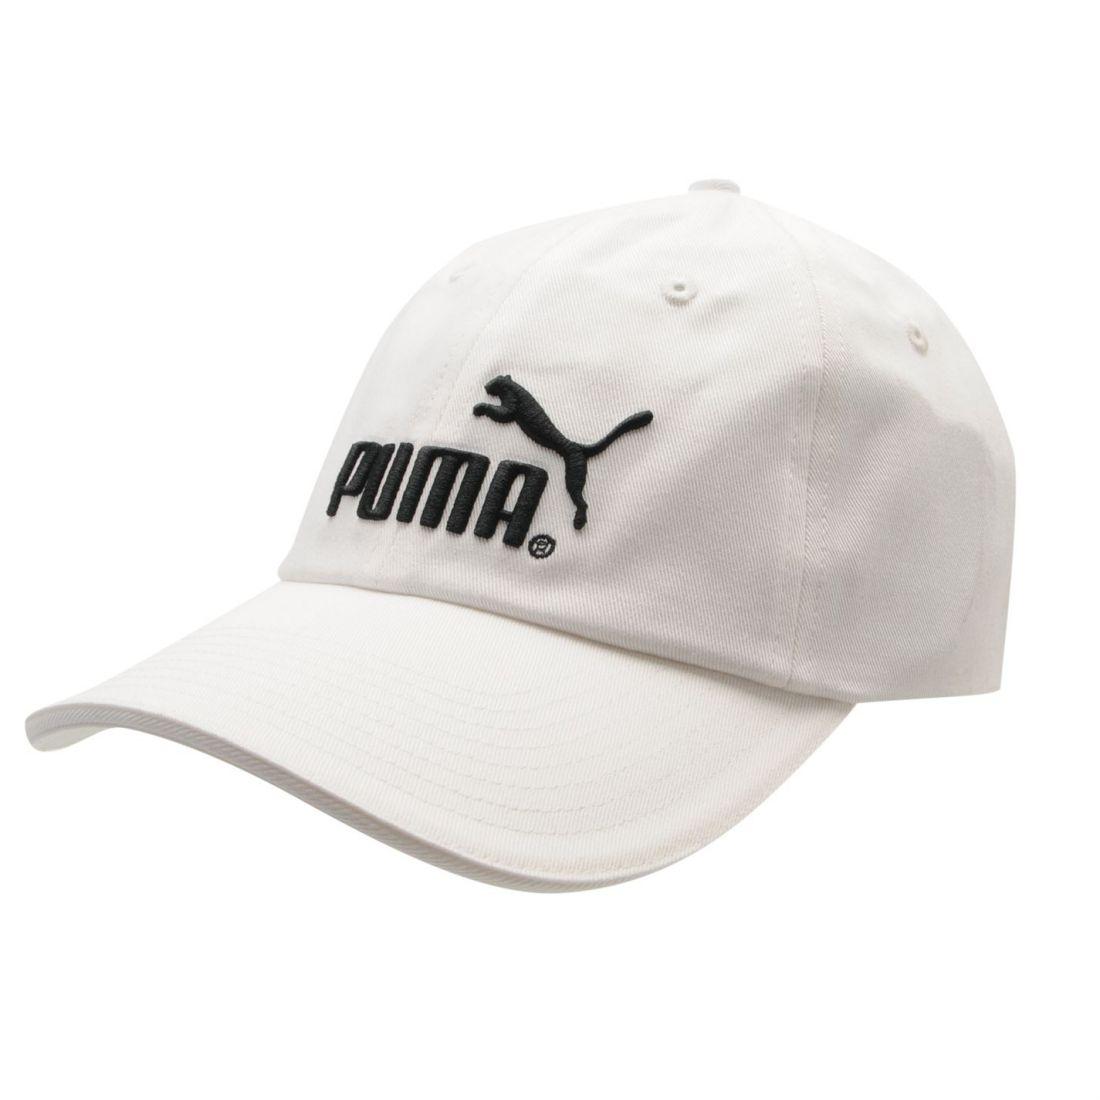 ba3bb583390 Image is loading Puma-Mens-logo-Cap-Baseball-Cotton